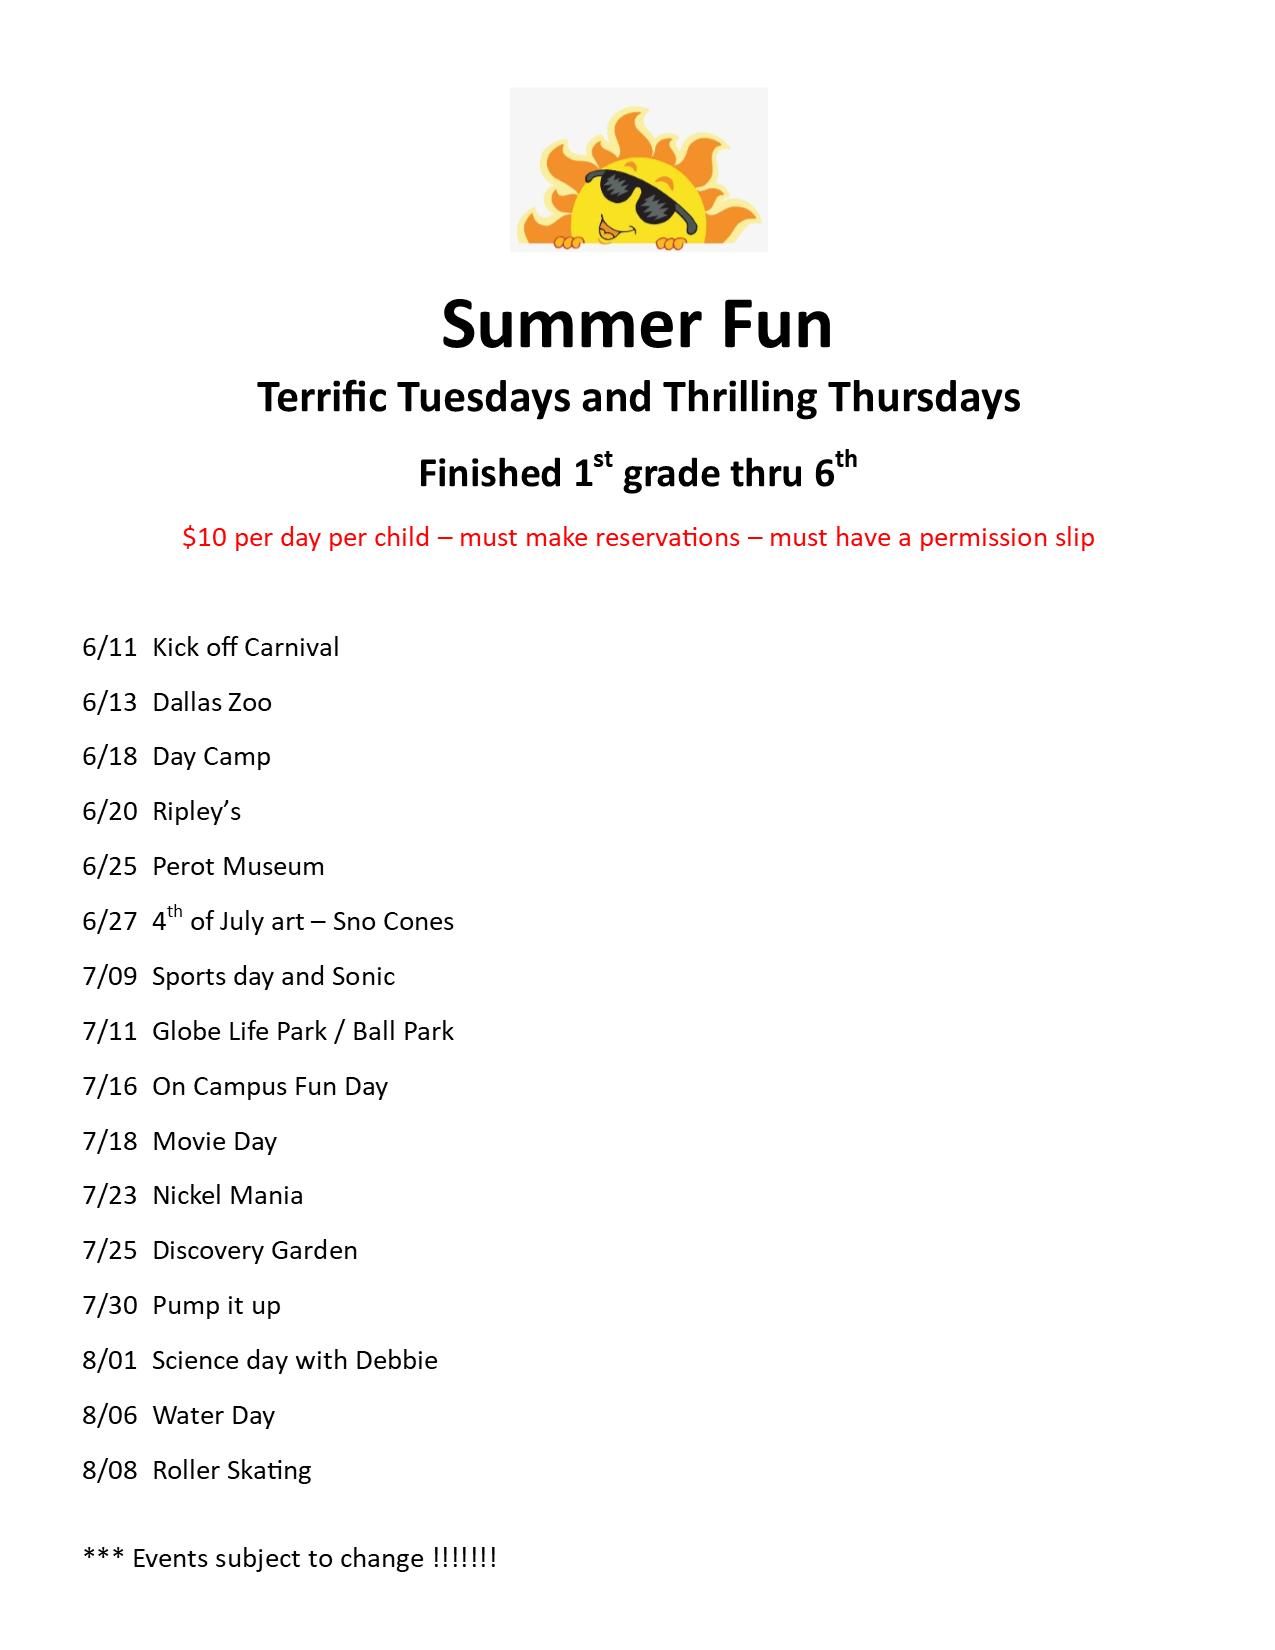 Summer Fun 2019.png